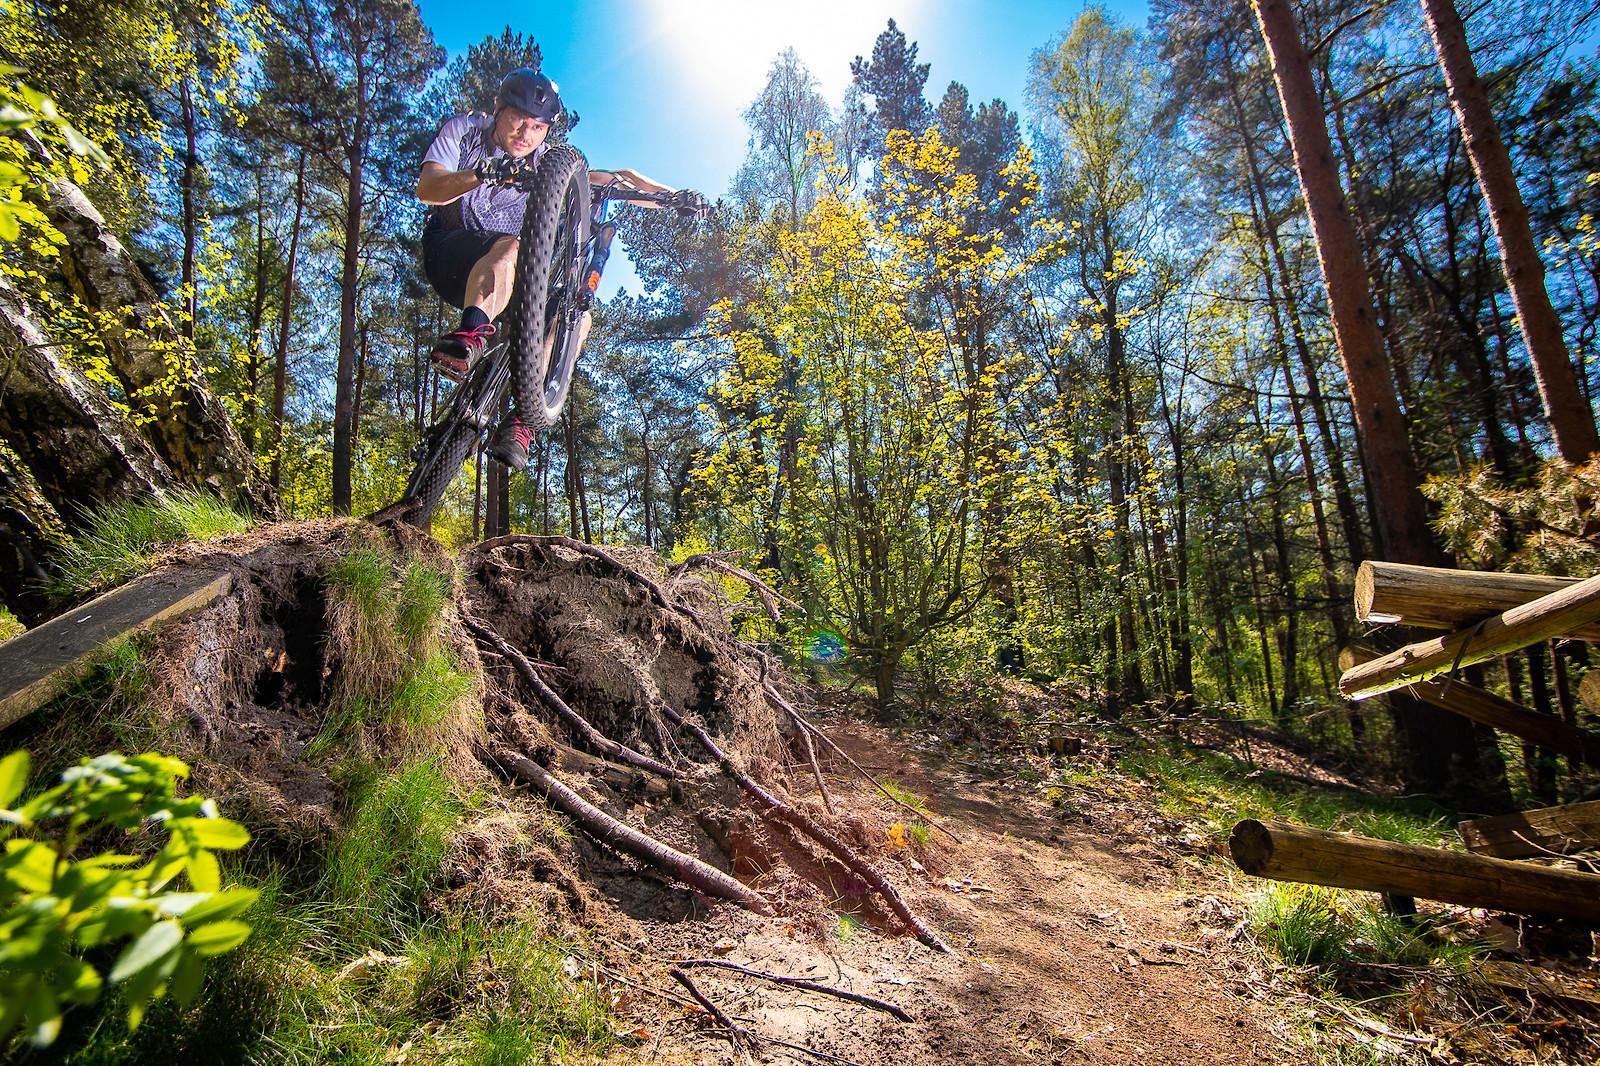 Stump Kicker - Robert_Loughlin - Mountain Biking Pictures - Vital MTB